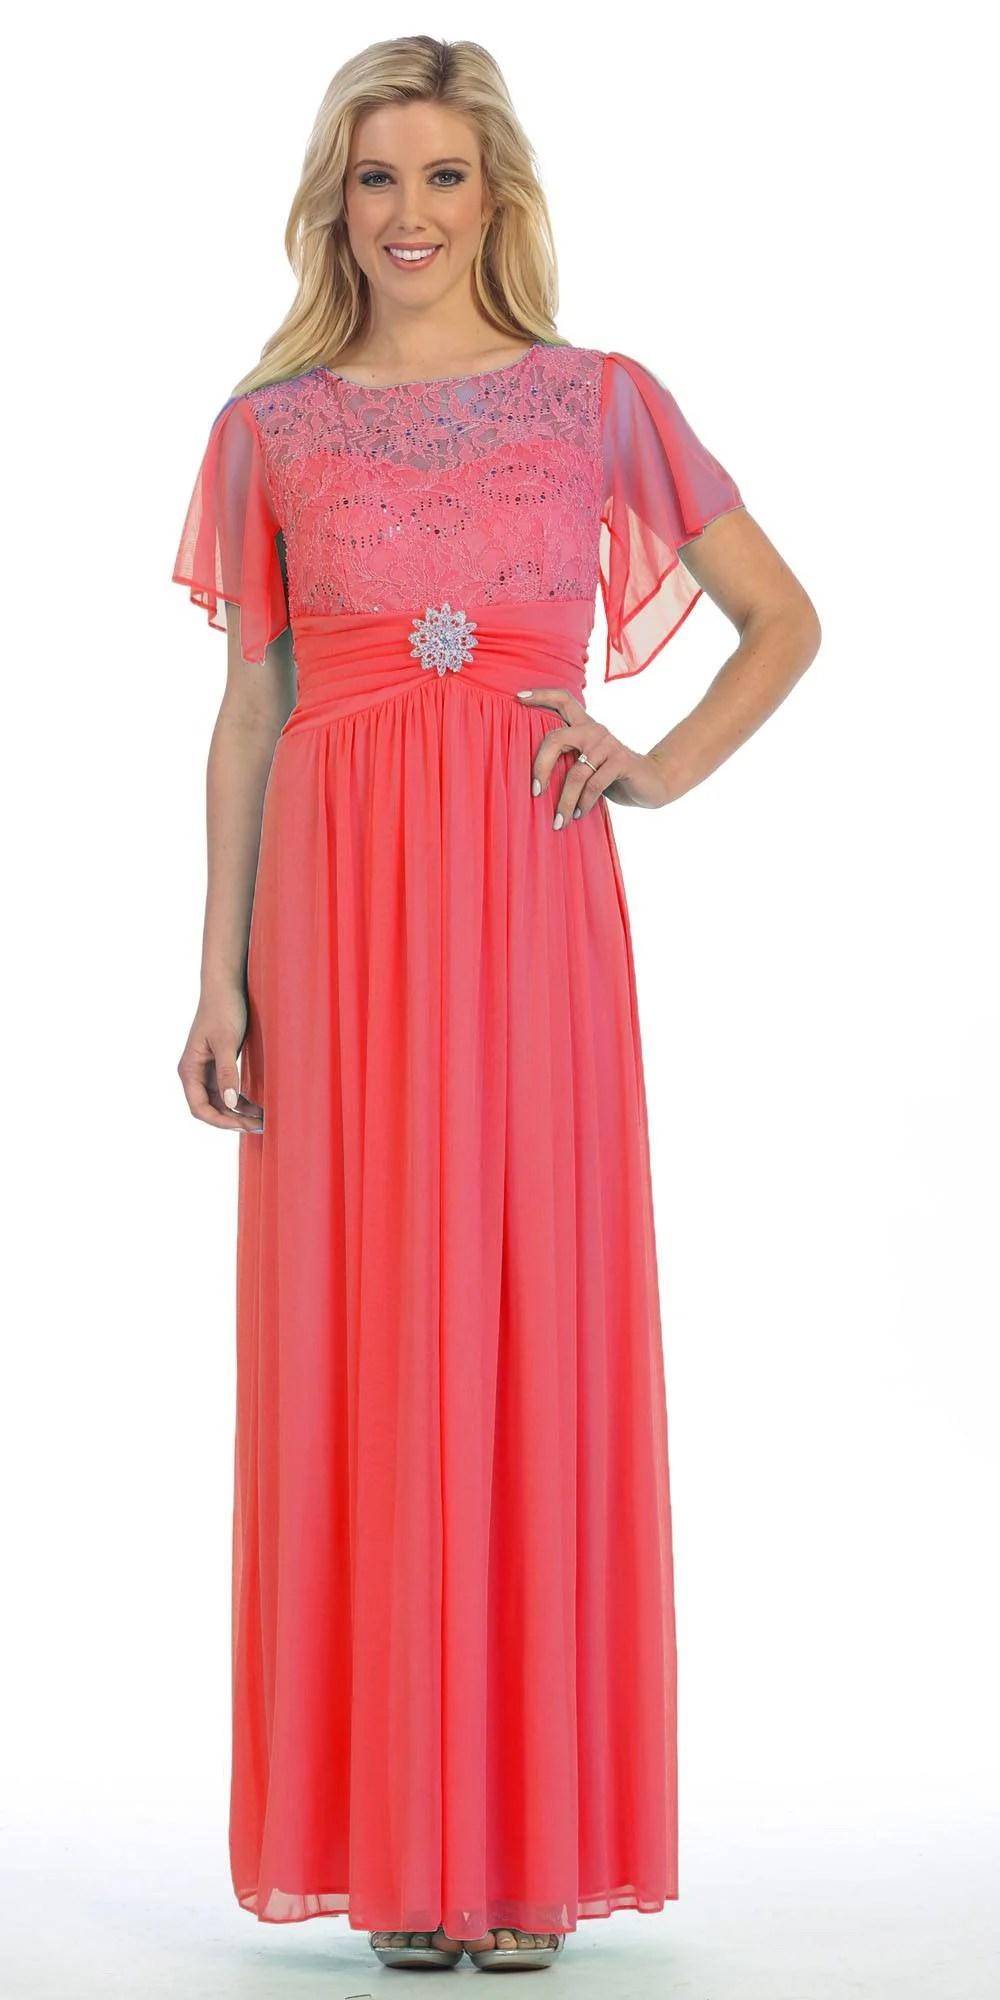 Lace Long Sleeve Semi Formal Dresses